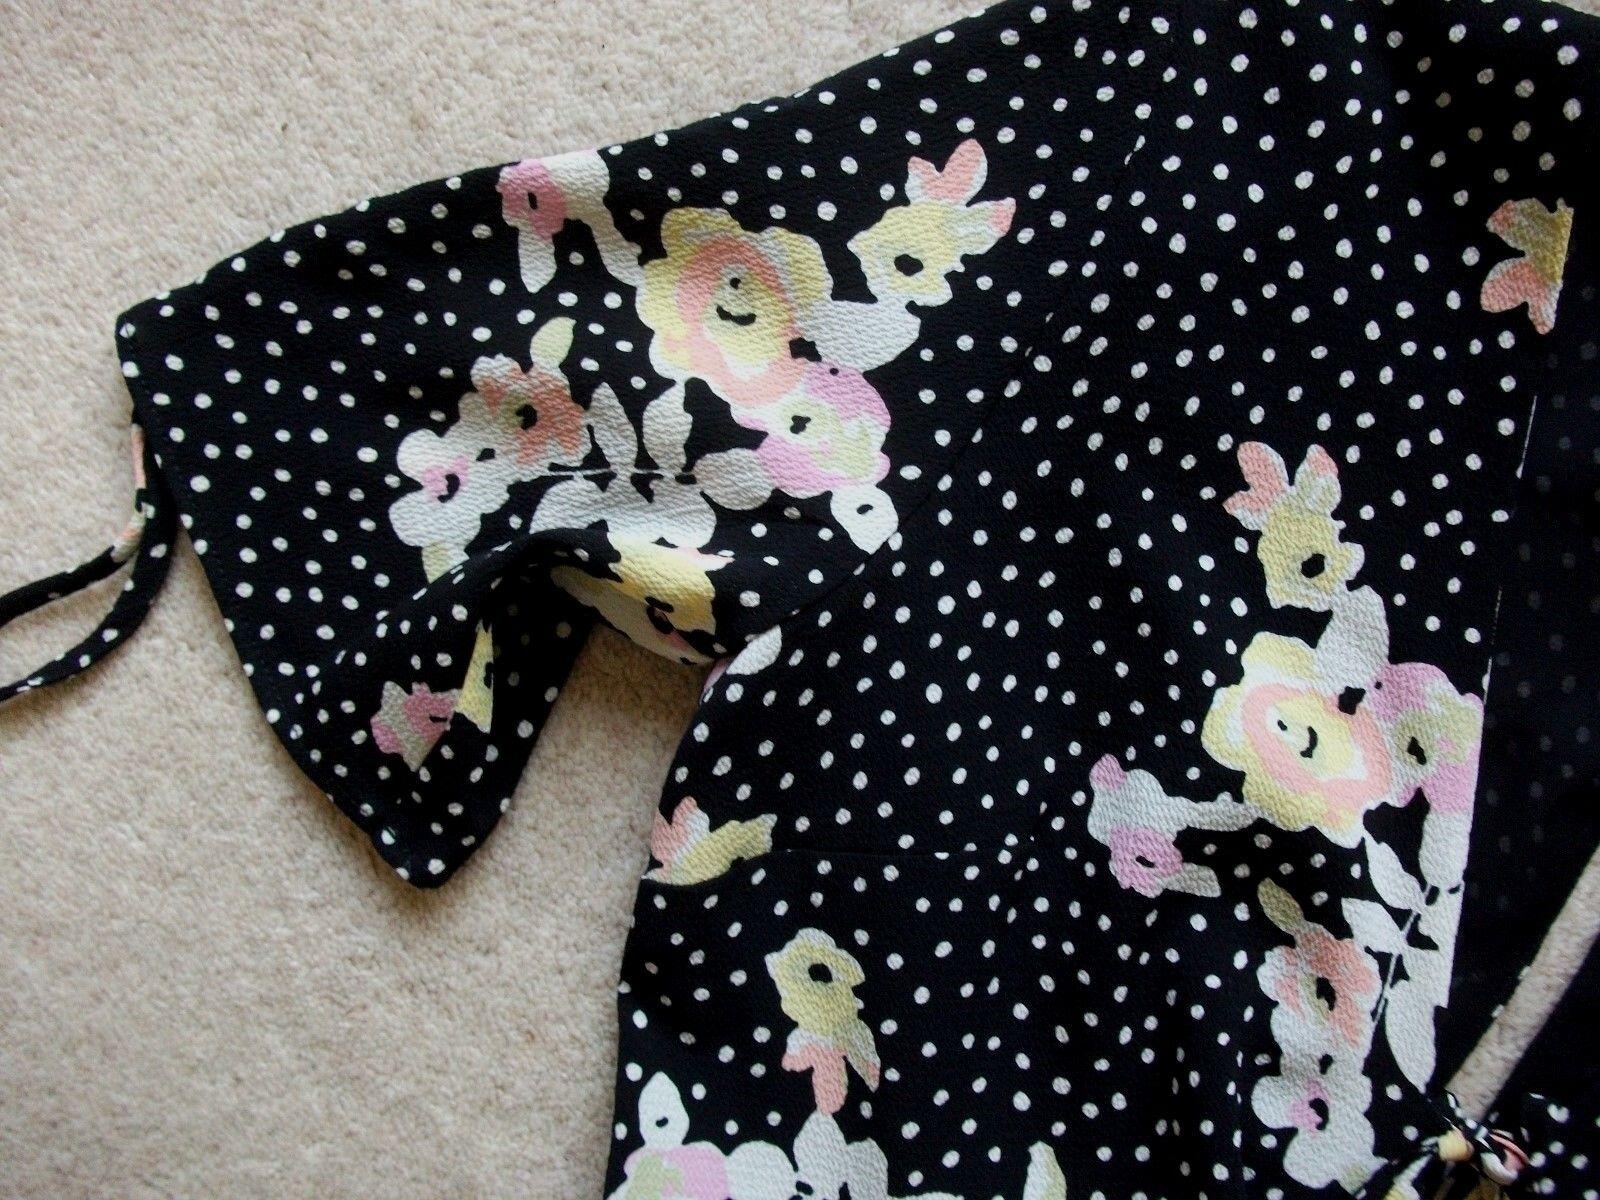 Topshop Noir Robe-Taille Pois et Floral Flippy Thé Robe-Taille Noir 6 7cebda